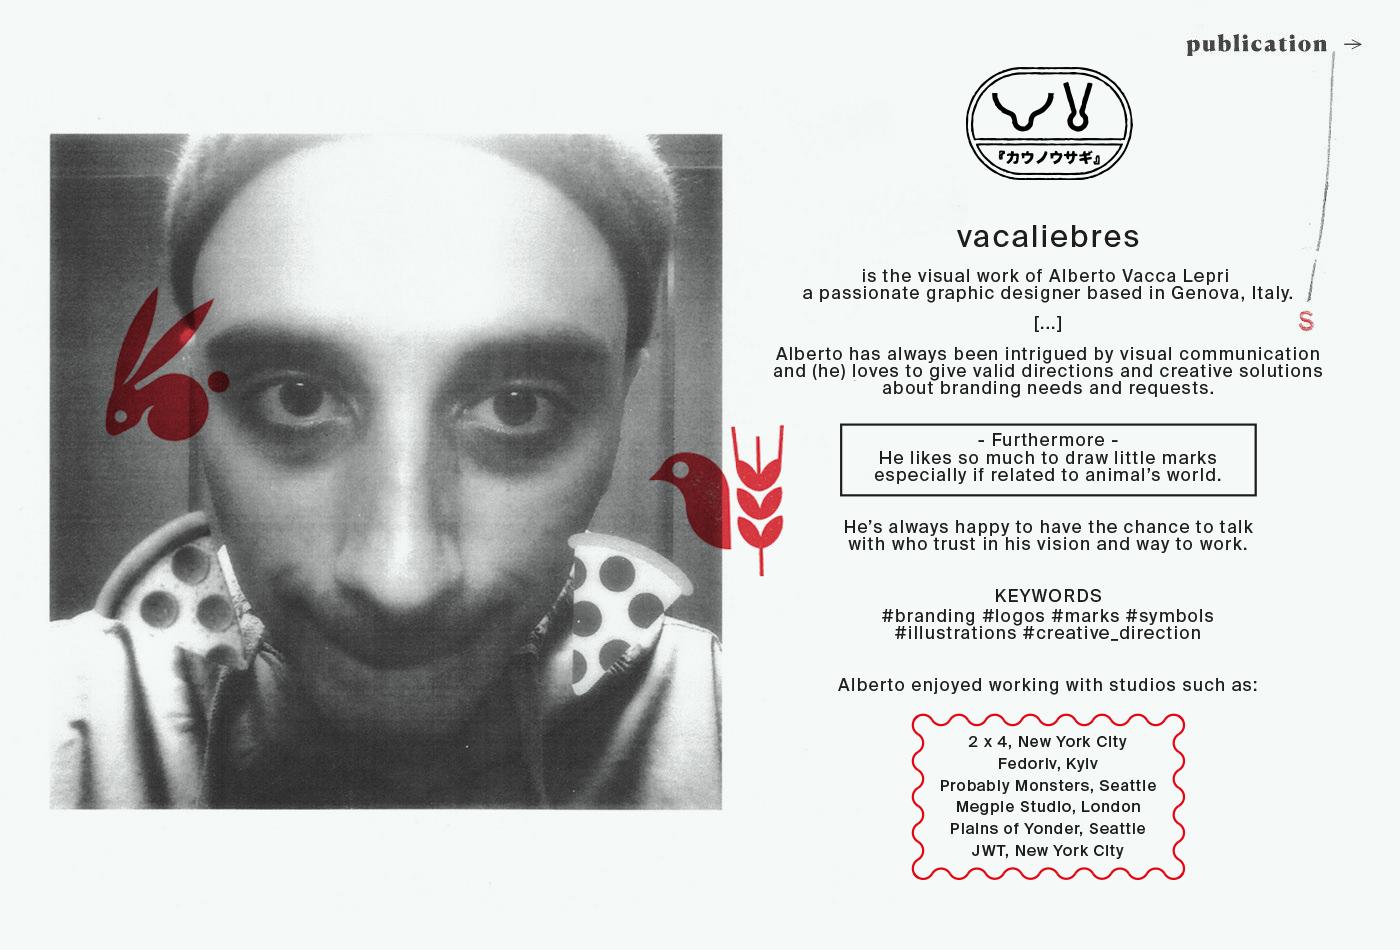 vacaliebres-albertovacca-alberto-vacca-lepri-vaccalepri-genova-logo-branding-logolounge-alberto-vacca-io